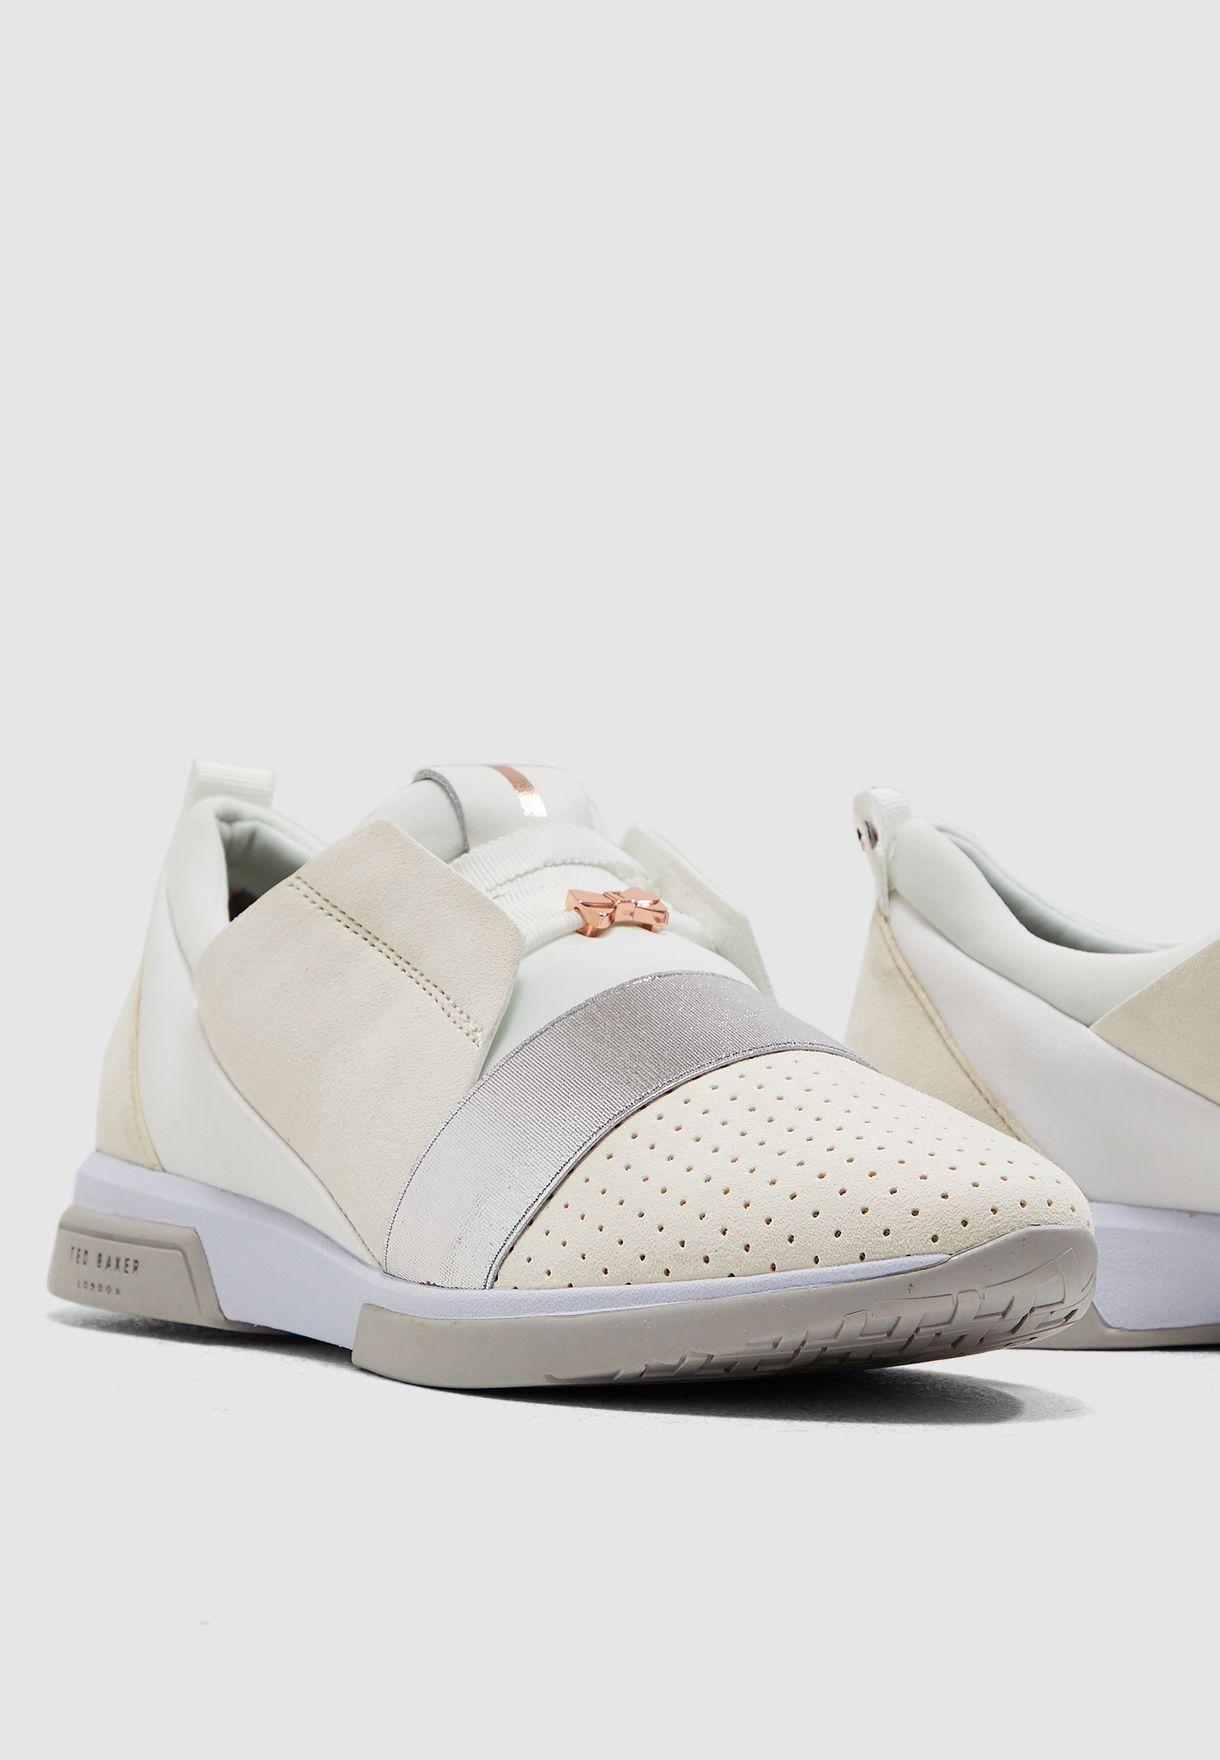 Cepas 3 Low top sneaker